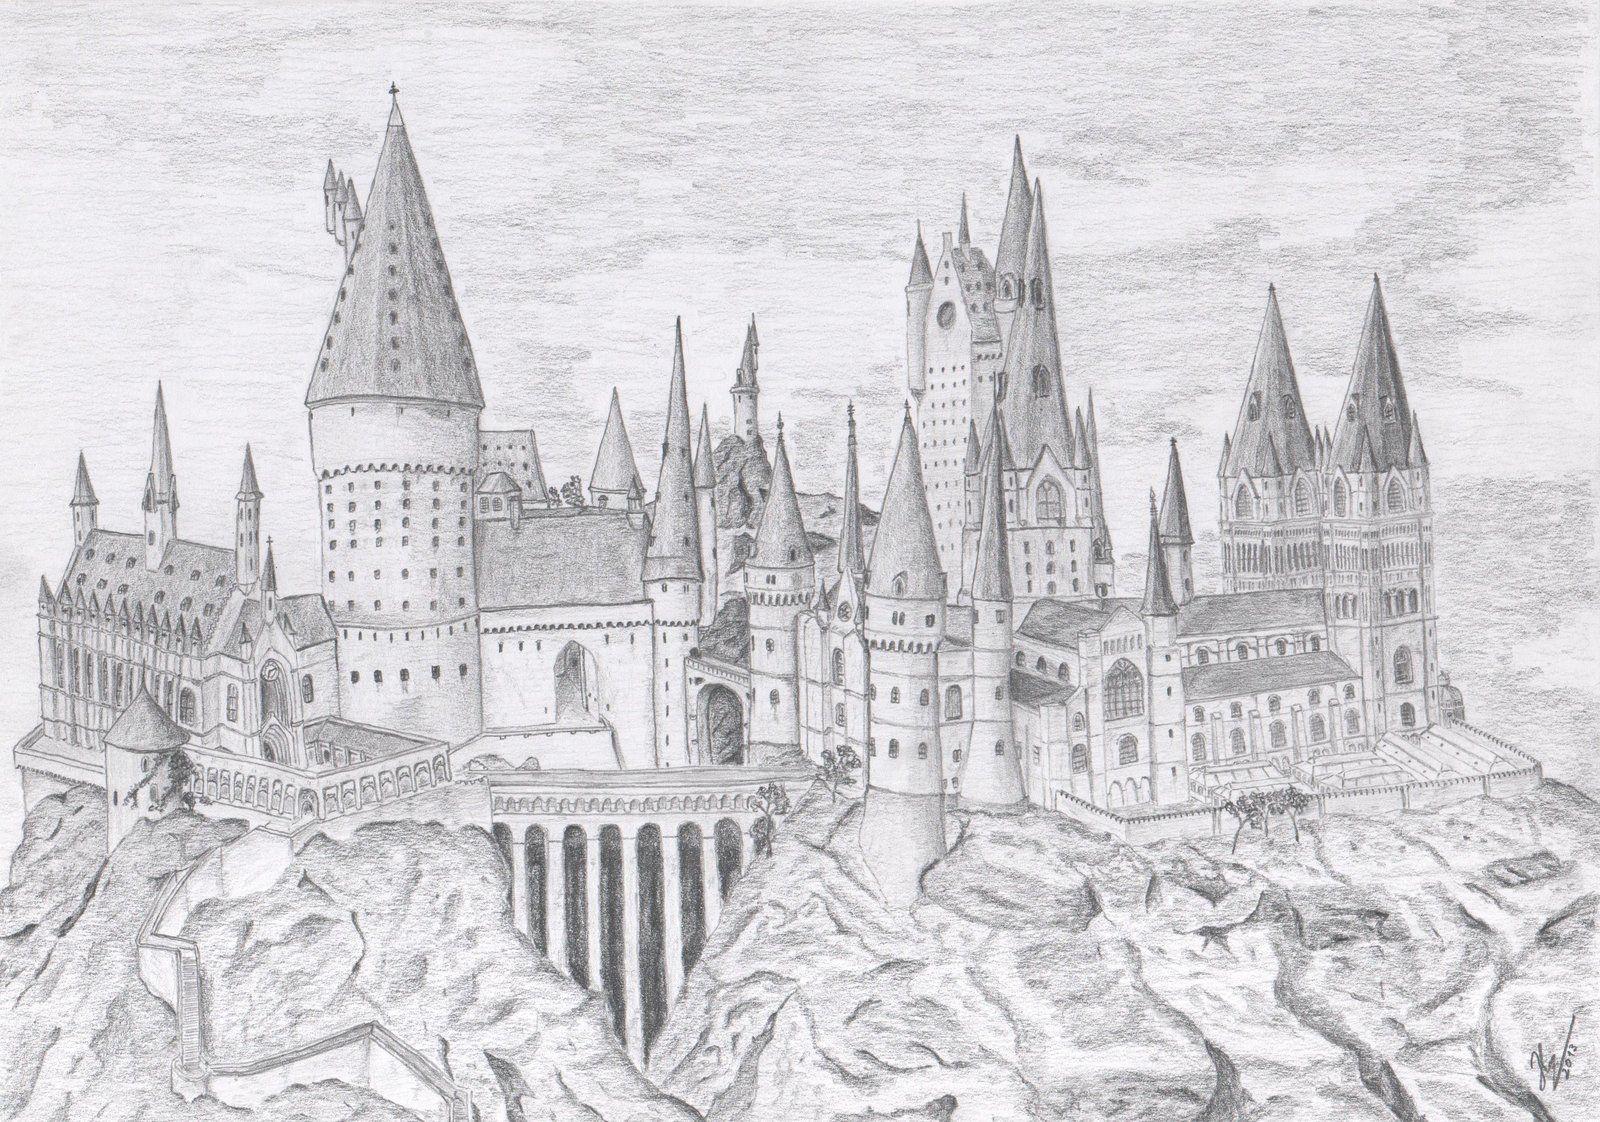 hogwarts tattoo - Cerca con Google | Harry-potter ...